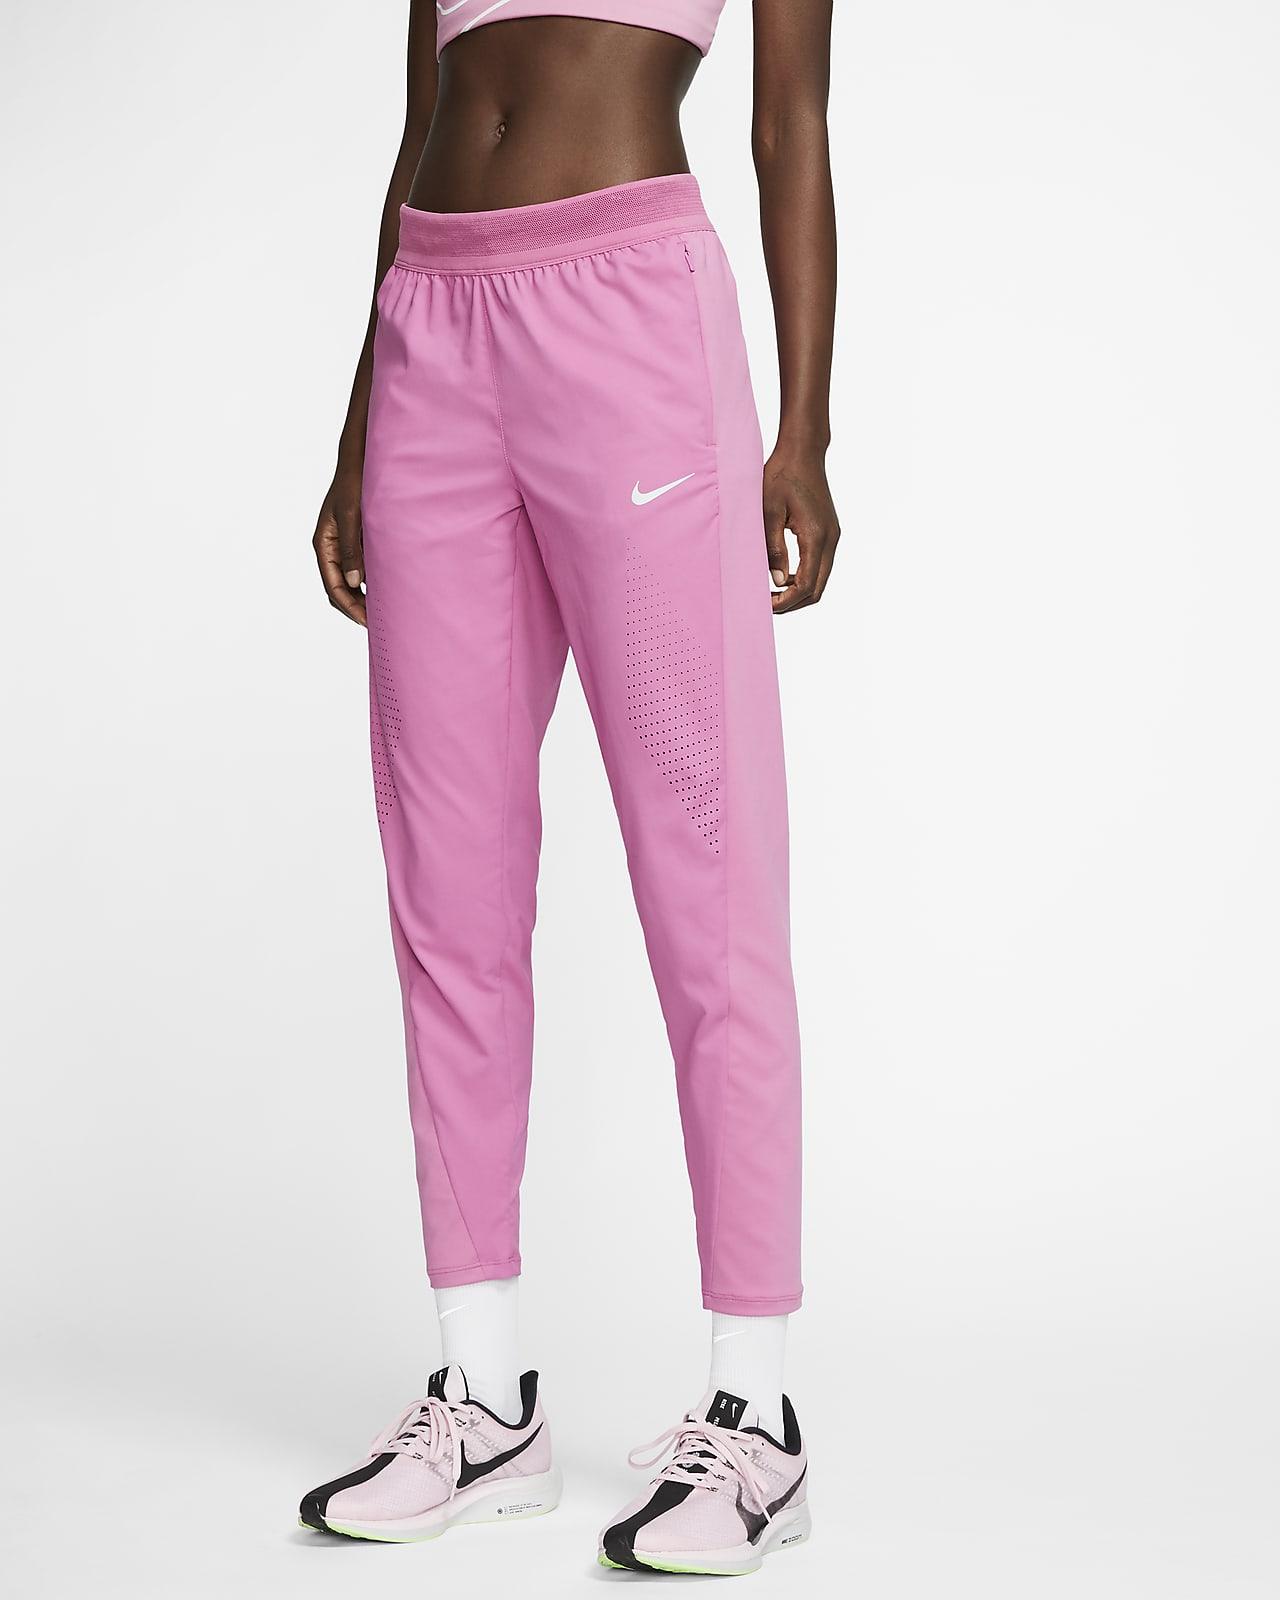 global Frente al mar Categoría  Nike Swift Pantalón de running - Mujer. Nike ES